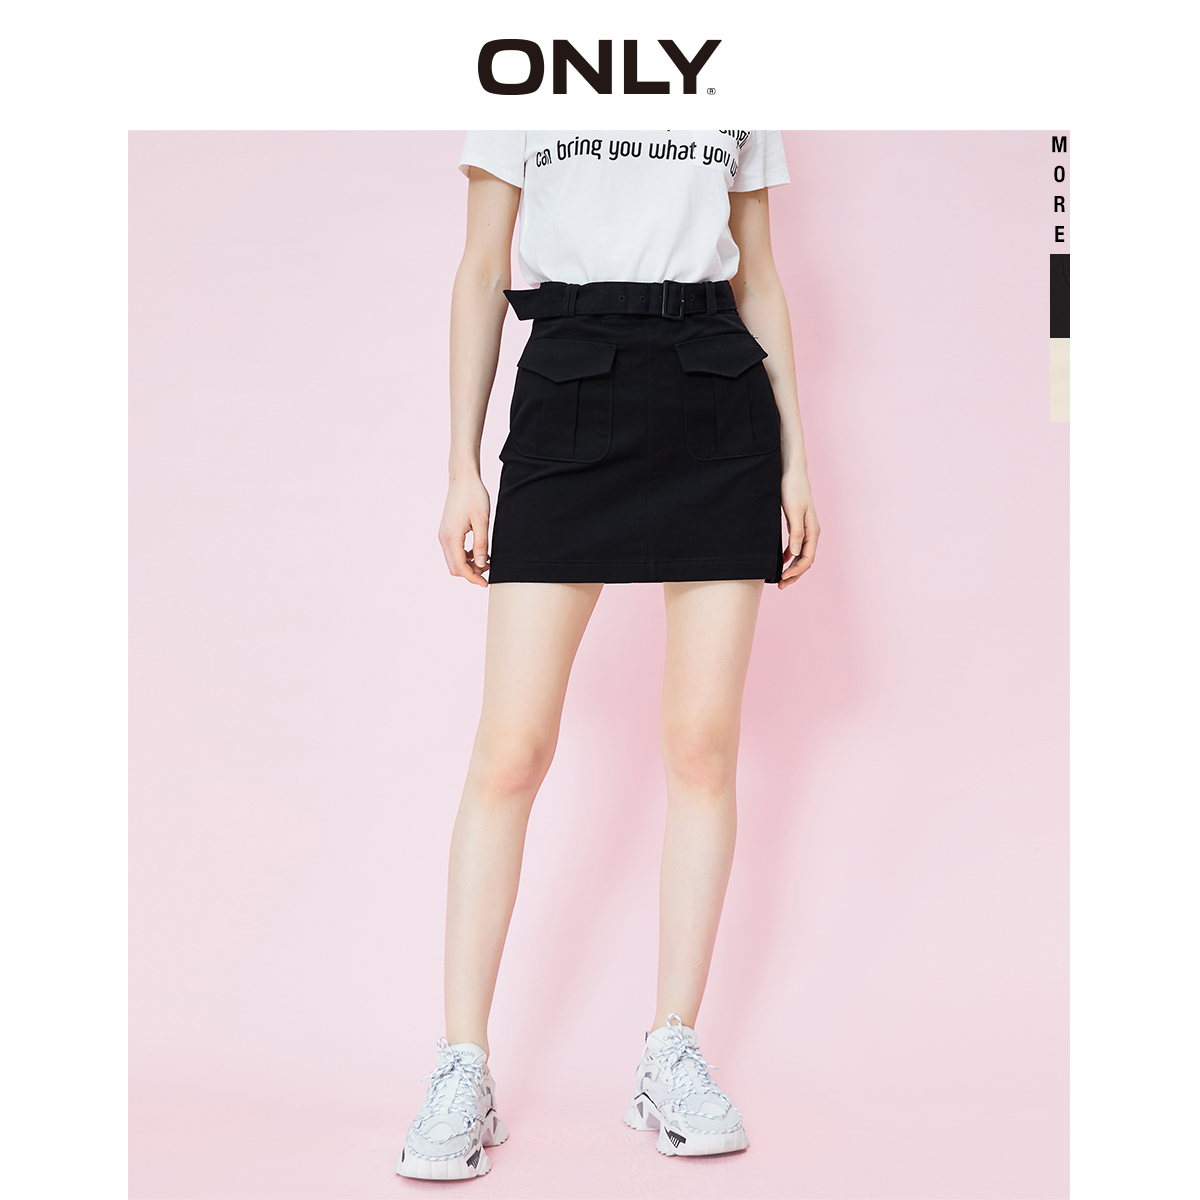 ONLY2020秋季新款高腰短裙直筒显瘦一步明线半身裙女|120116531